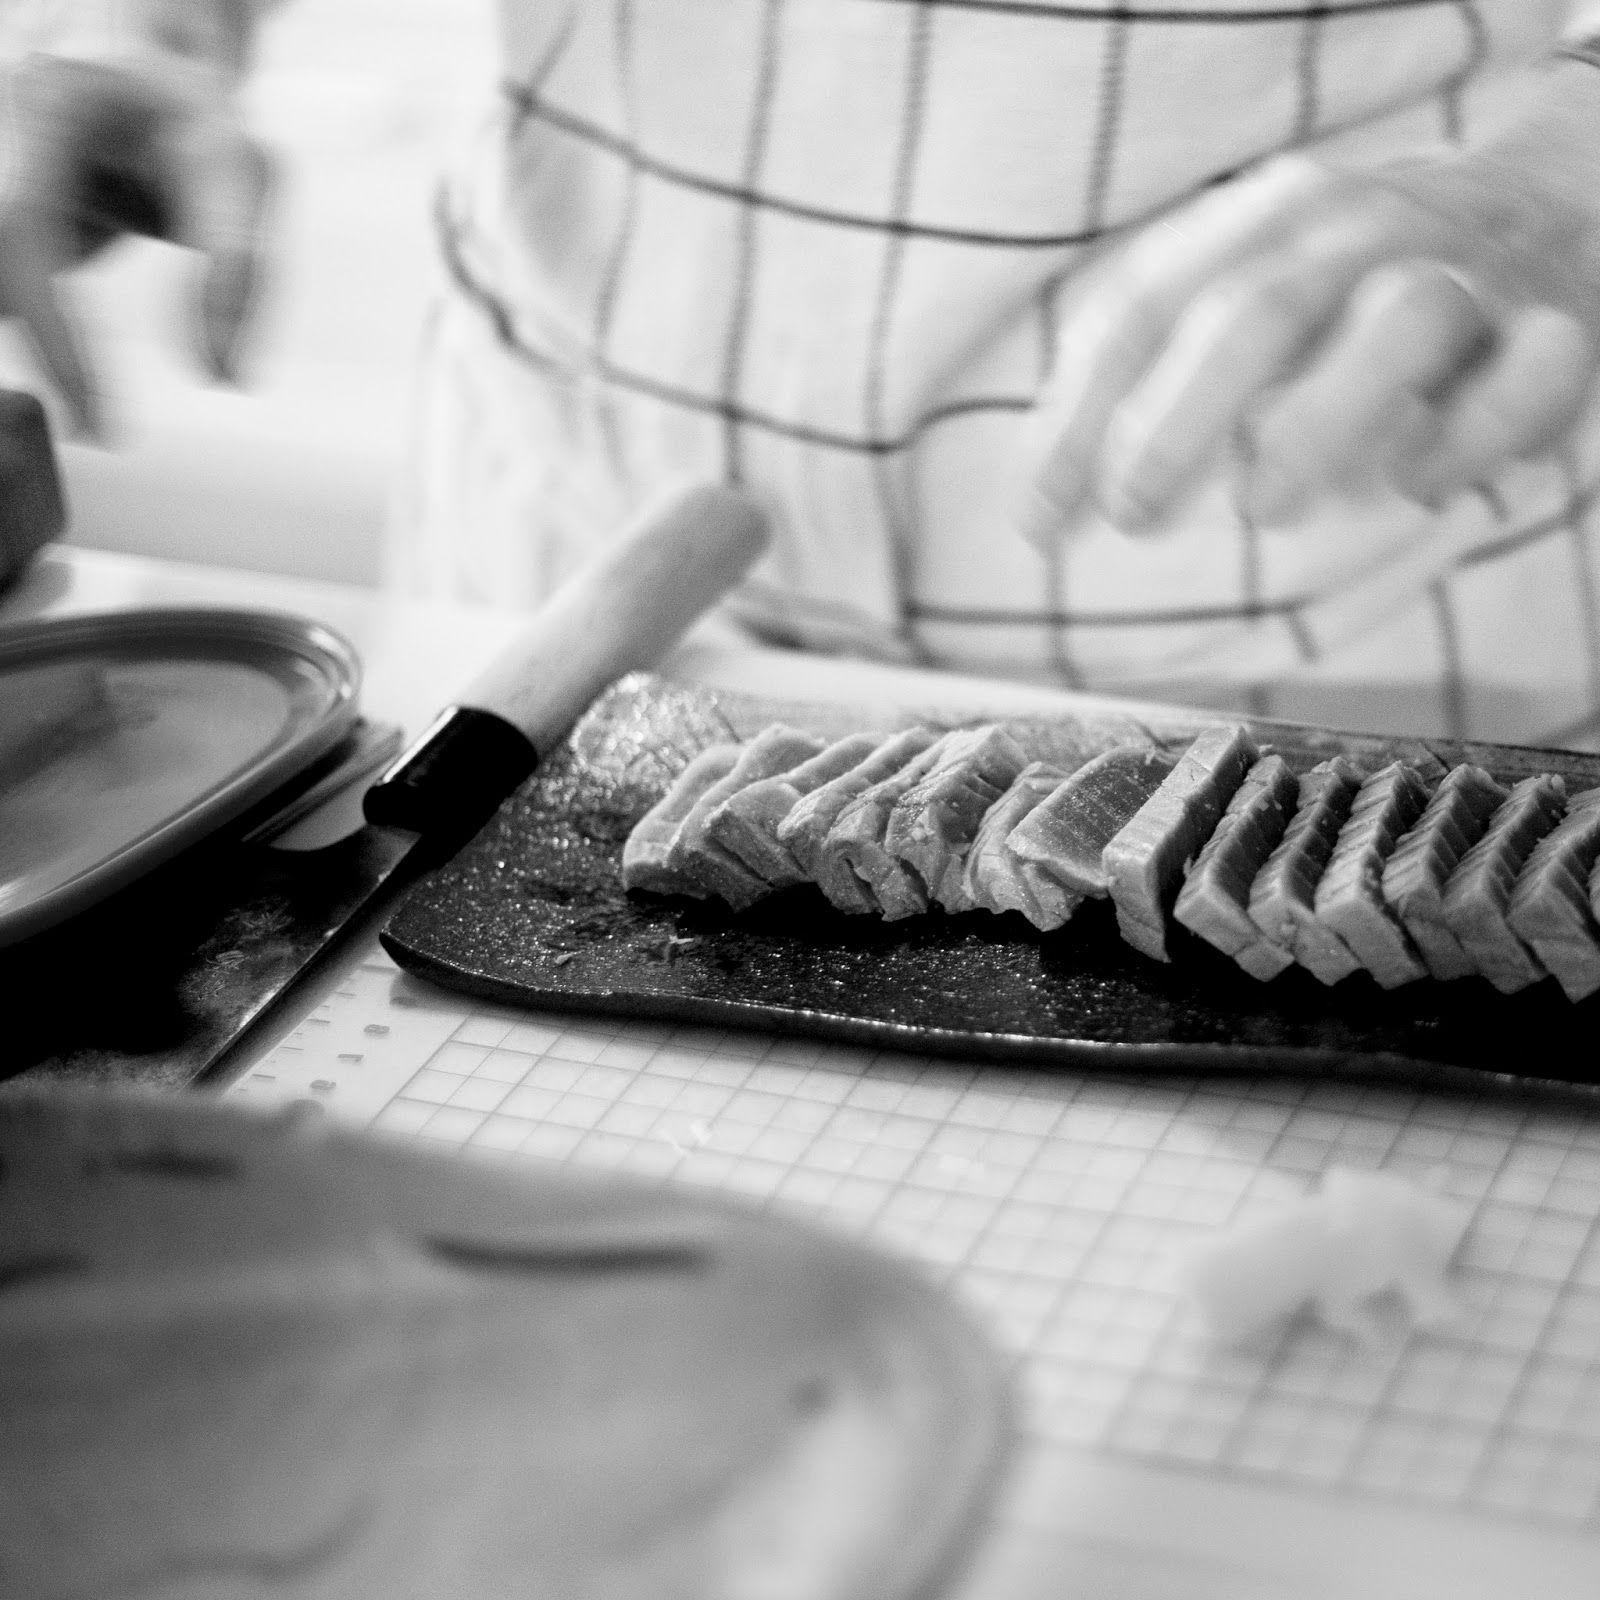 sushi home cooking fish pesce cucina food temaki